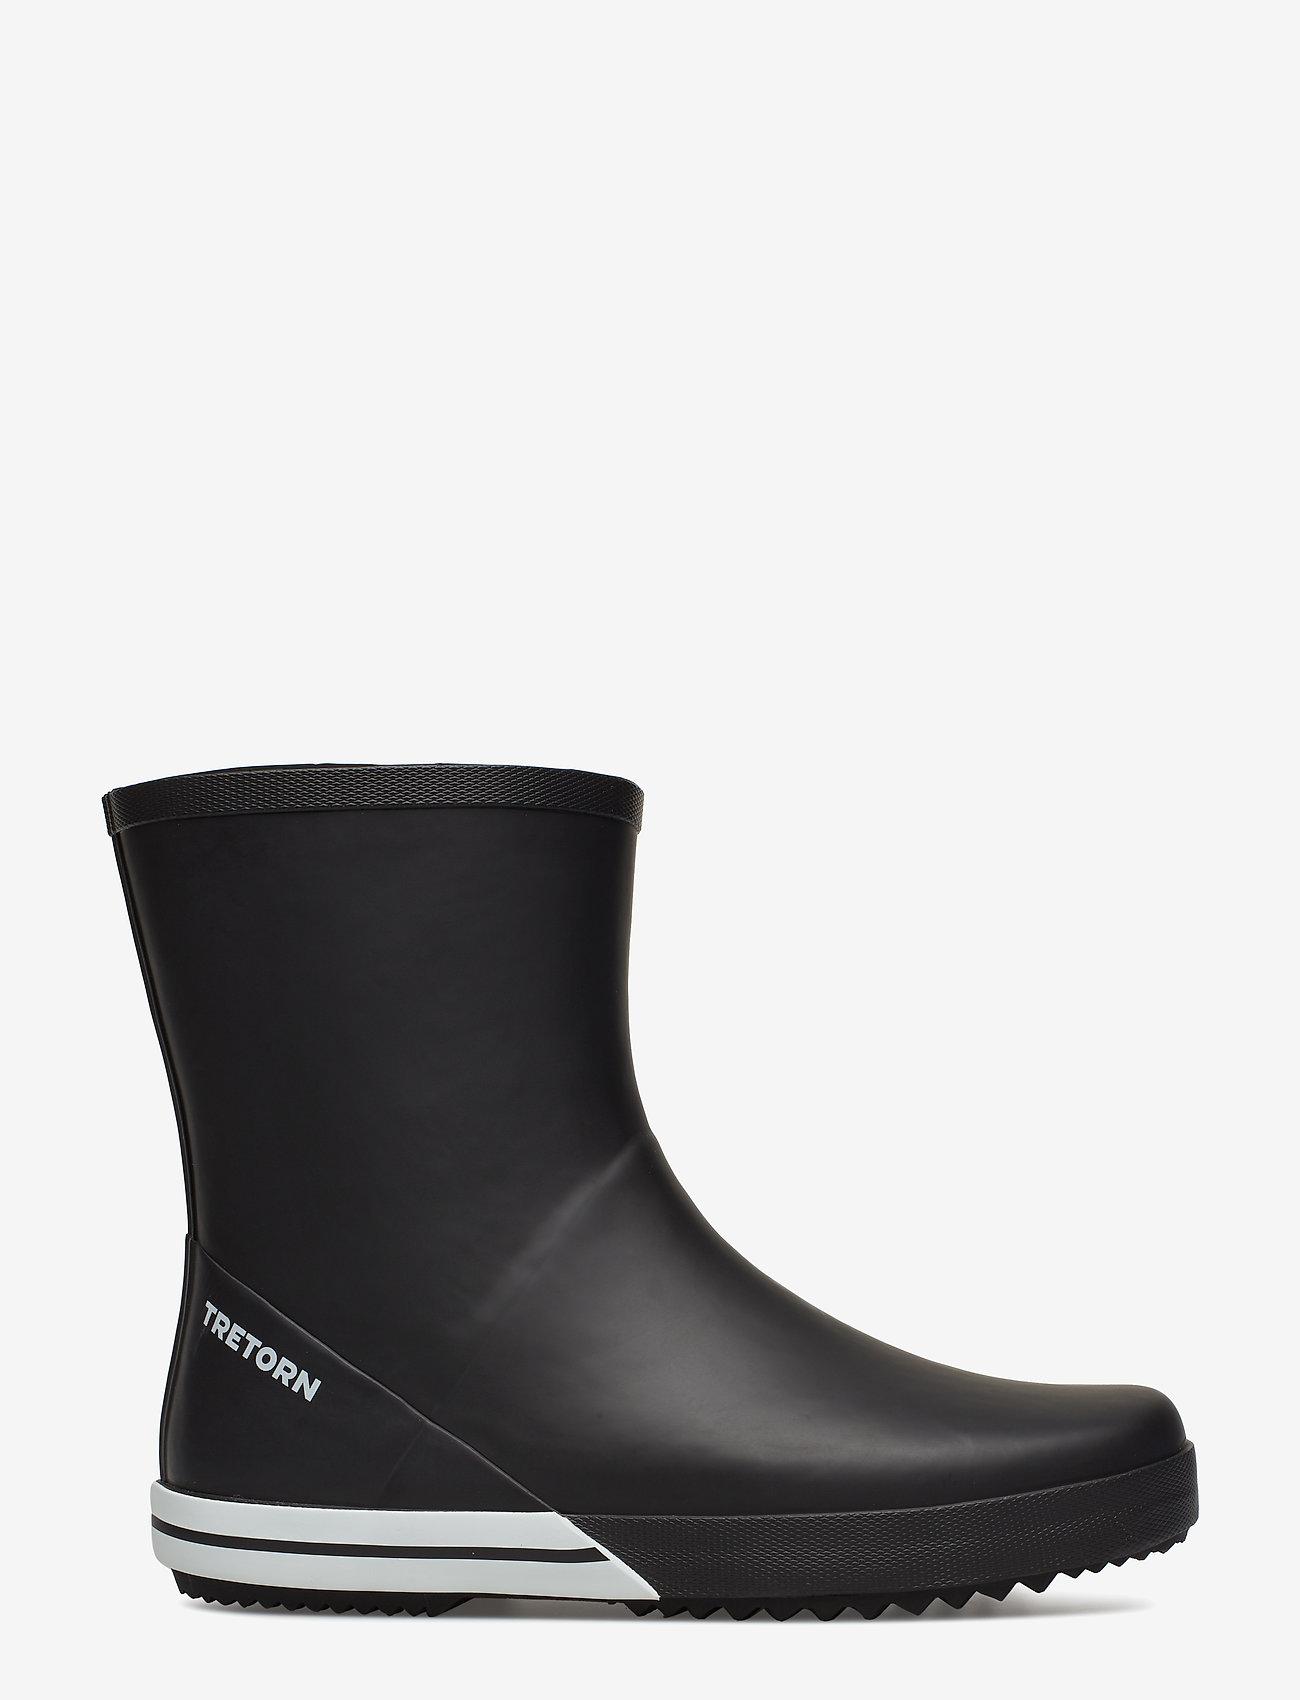 Tretorn - BASIC MID - rain boots - 010/black - 1